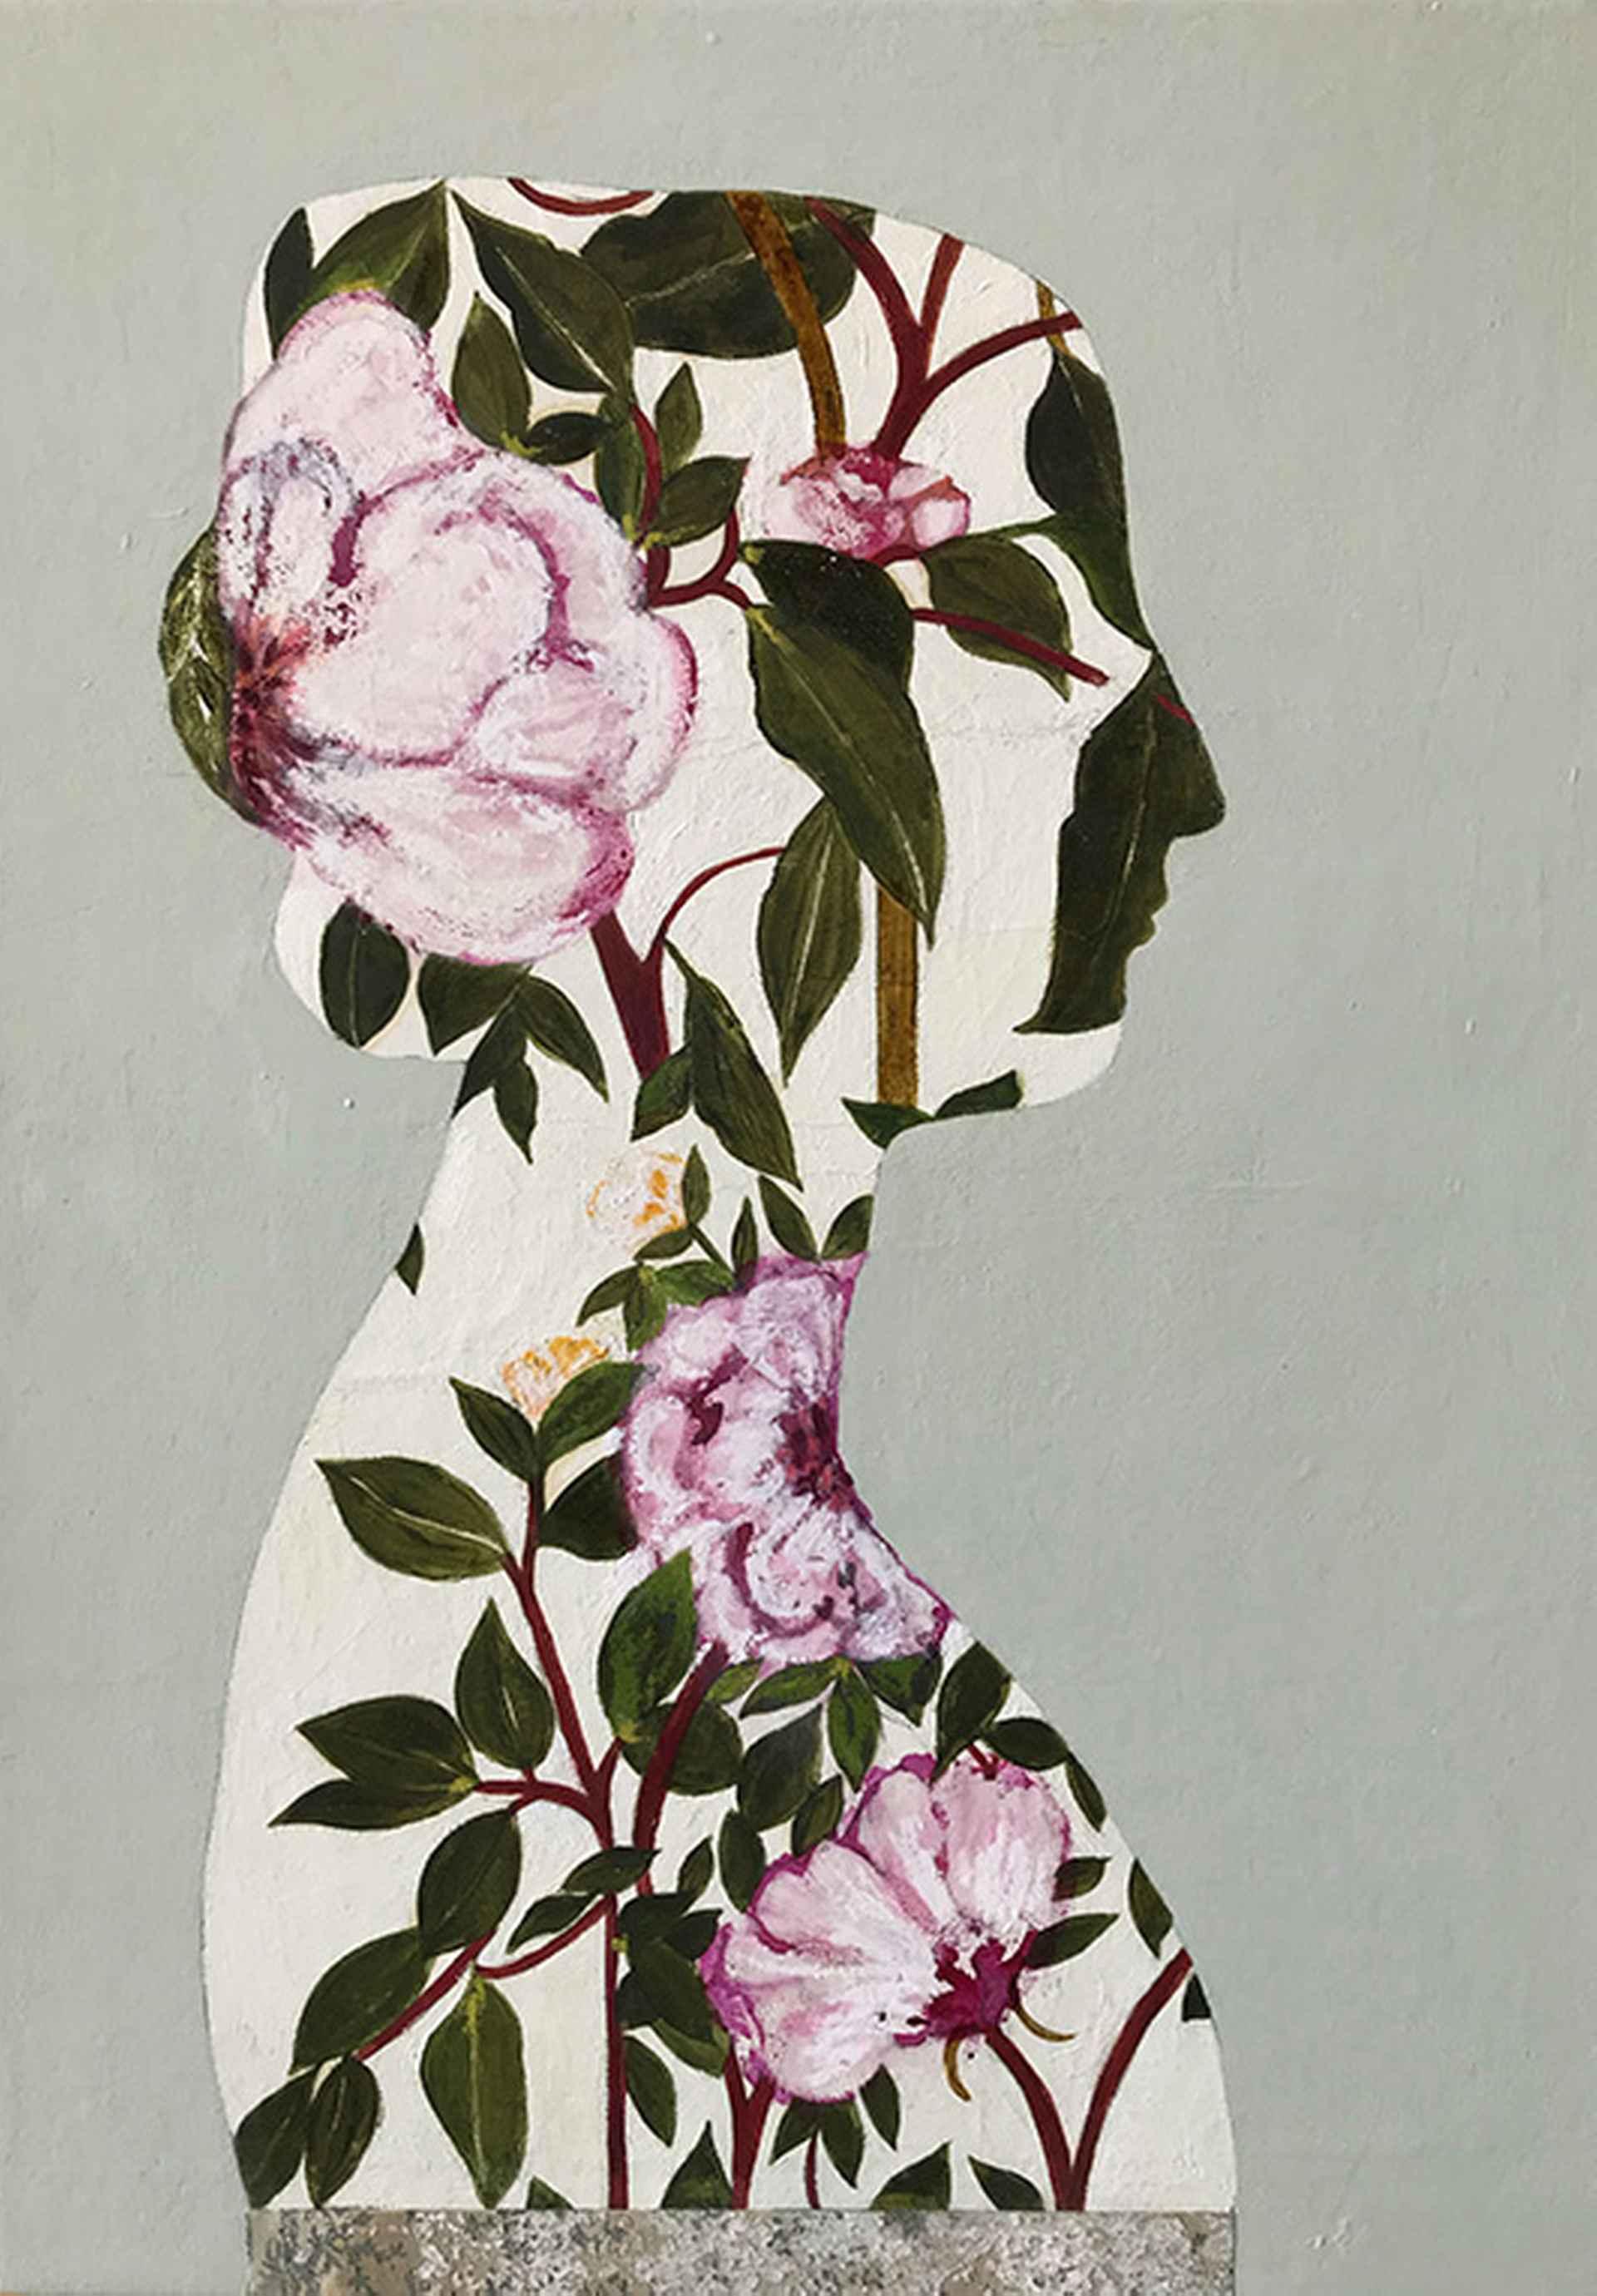 English Garden I by Karenina Fabrizzi